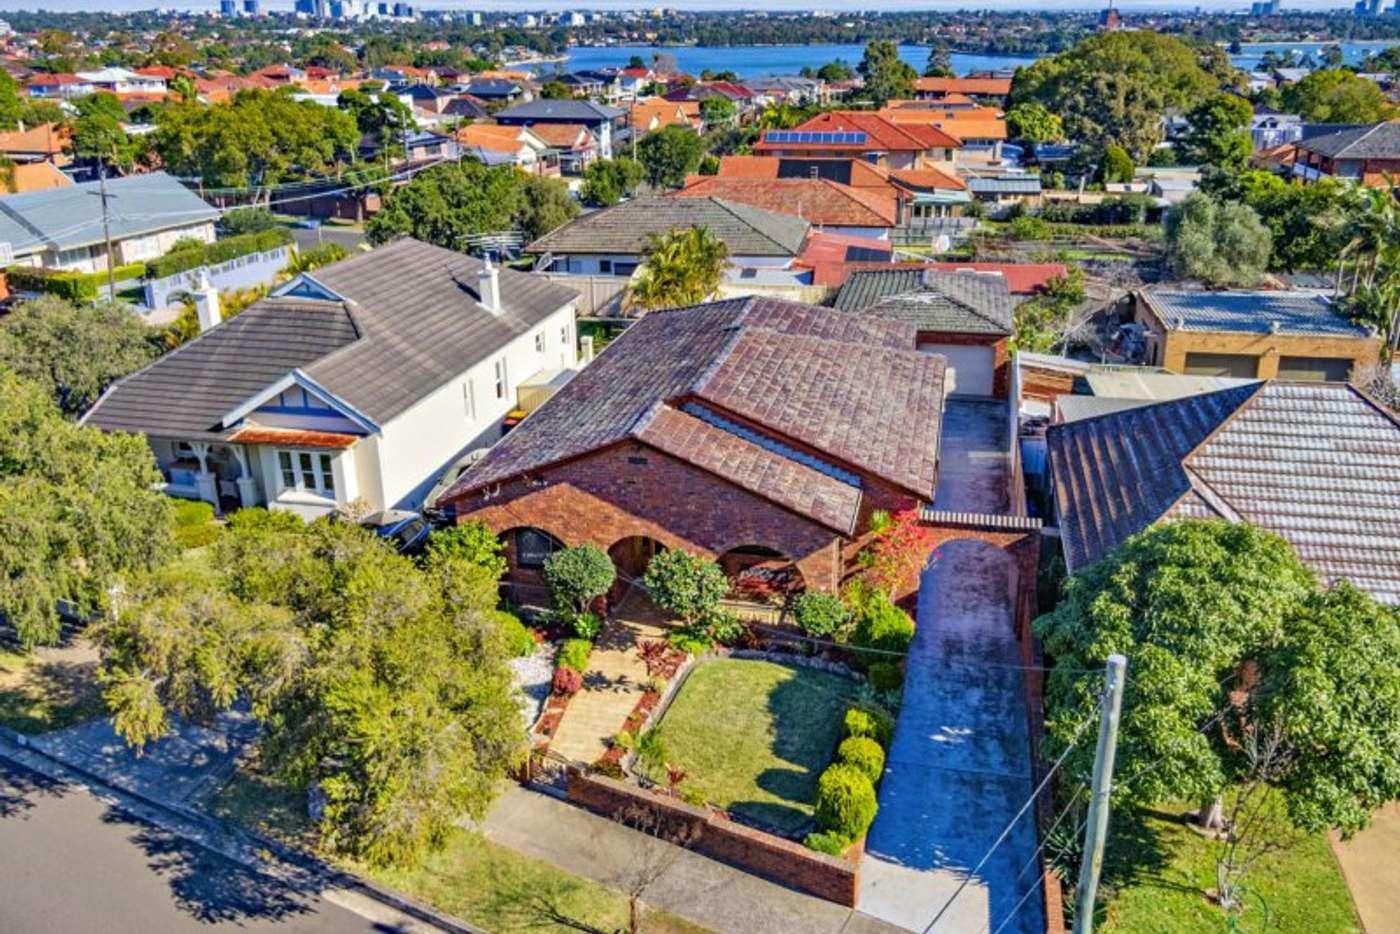 Main view of Homely house listing, 40 Wareemba Street, Wareemba NSW 2046